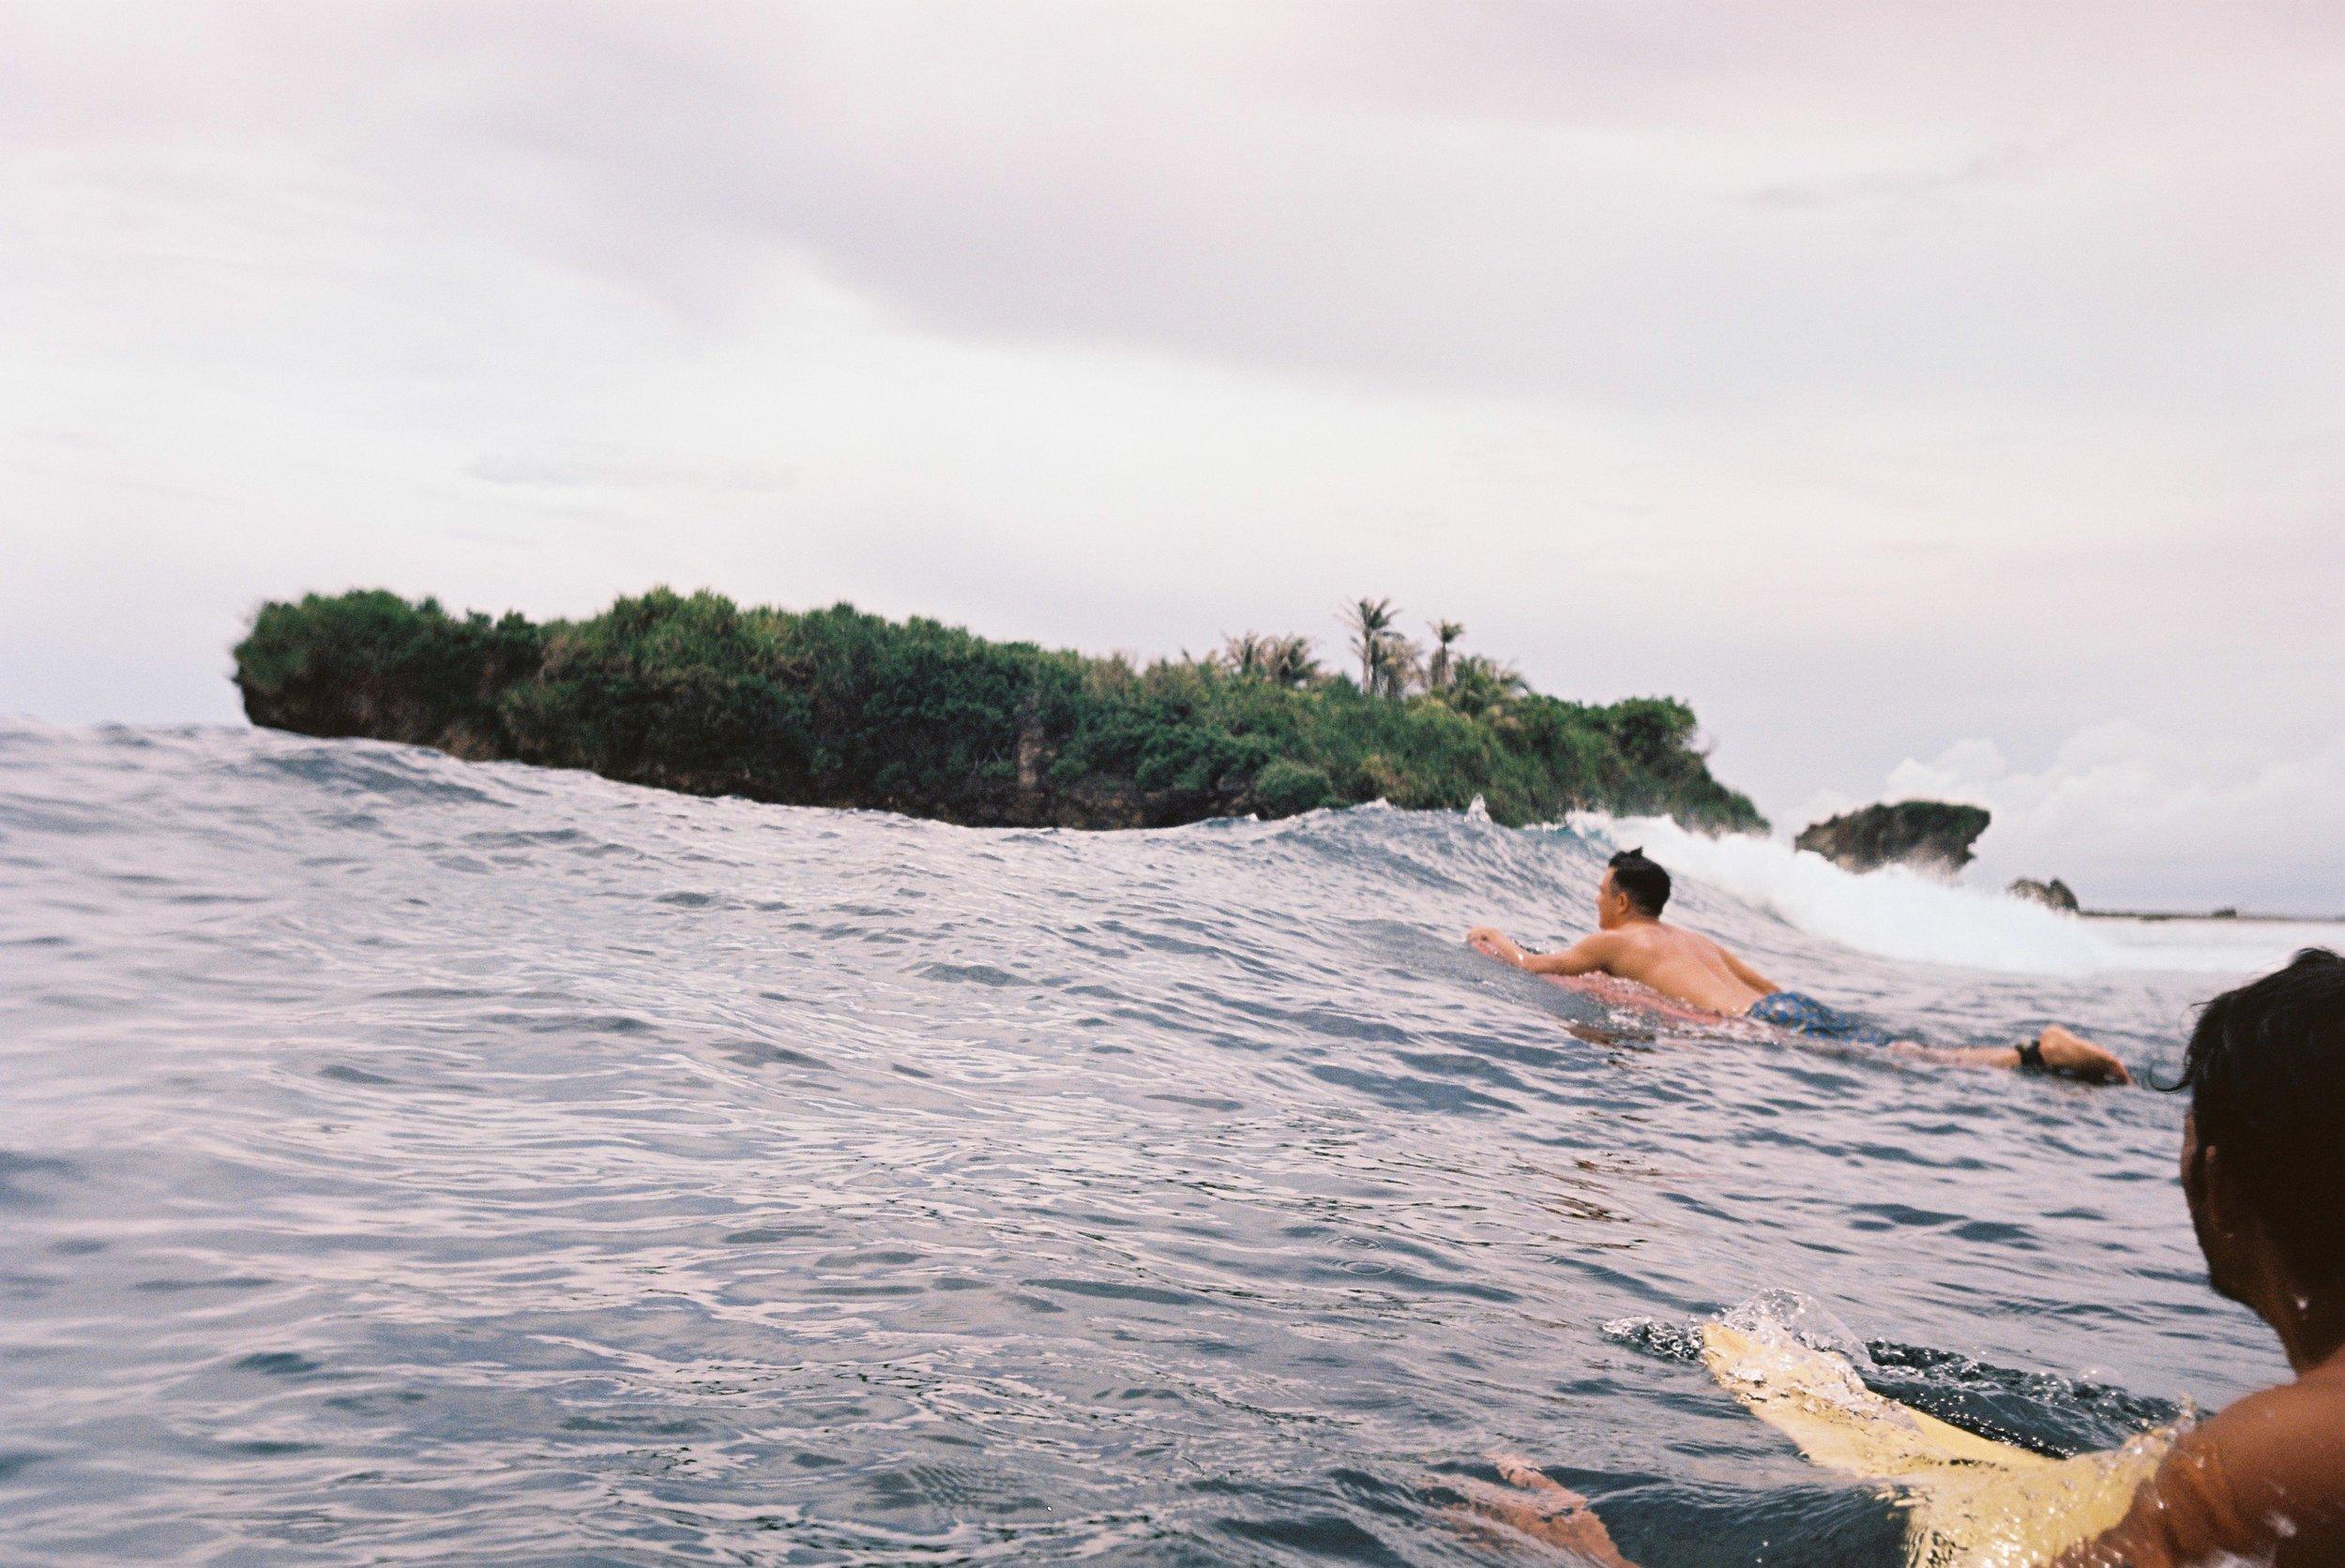 Philippines, 2017